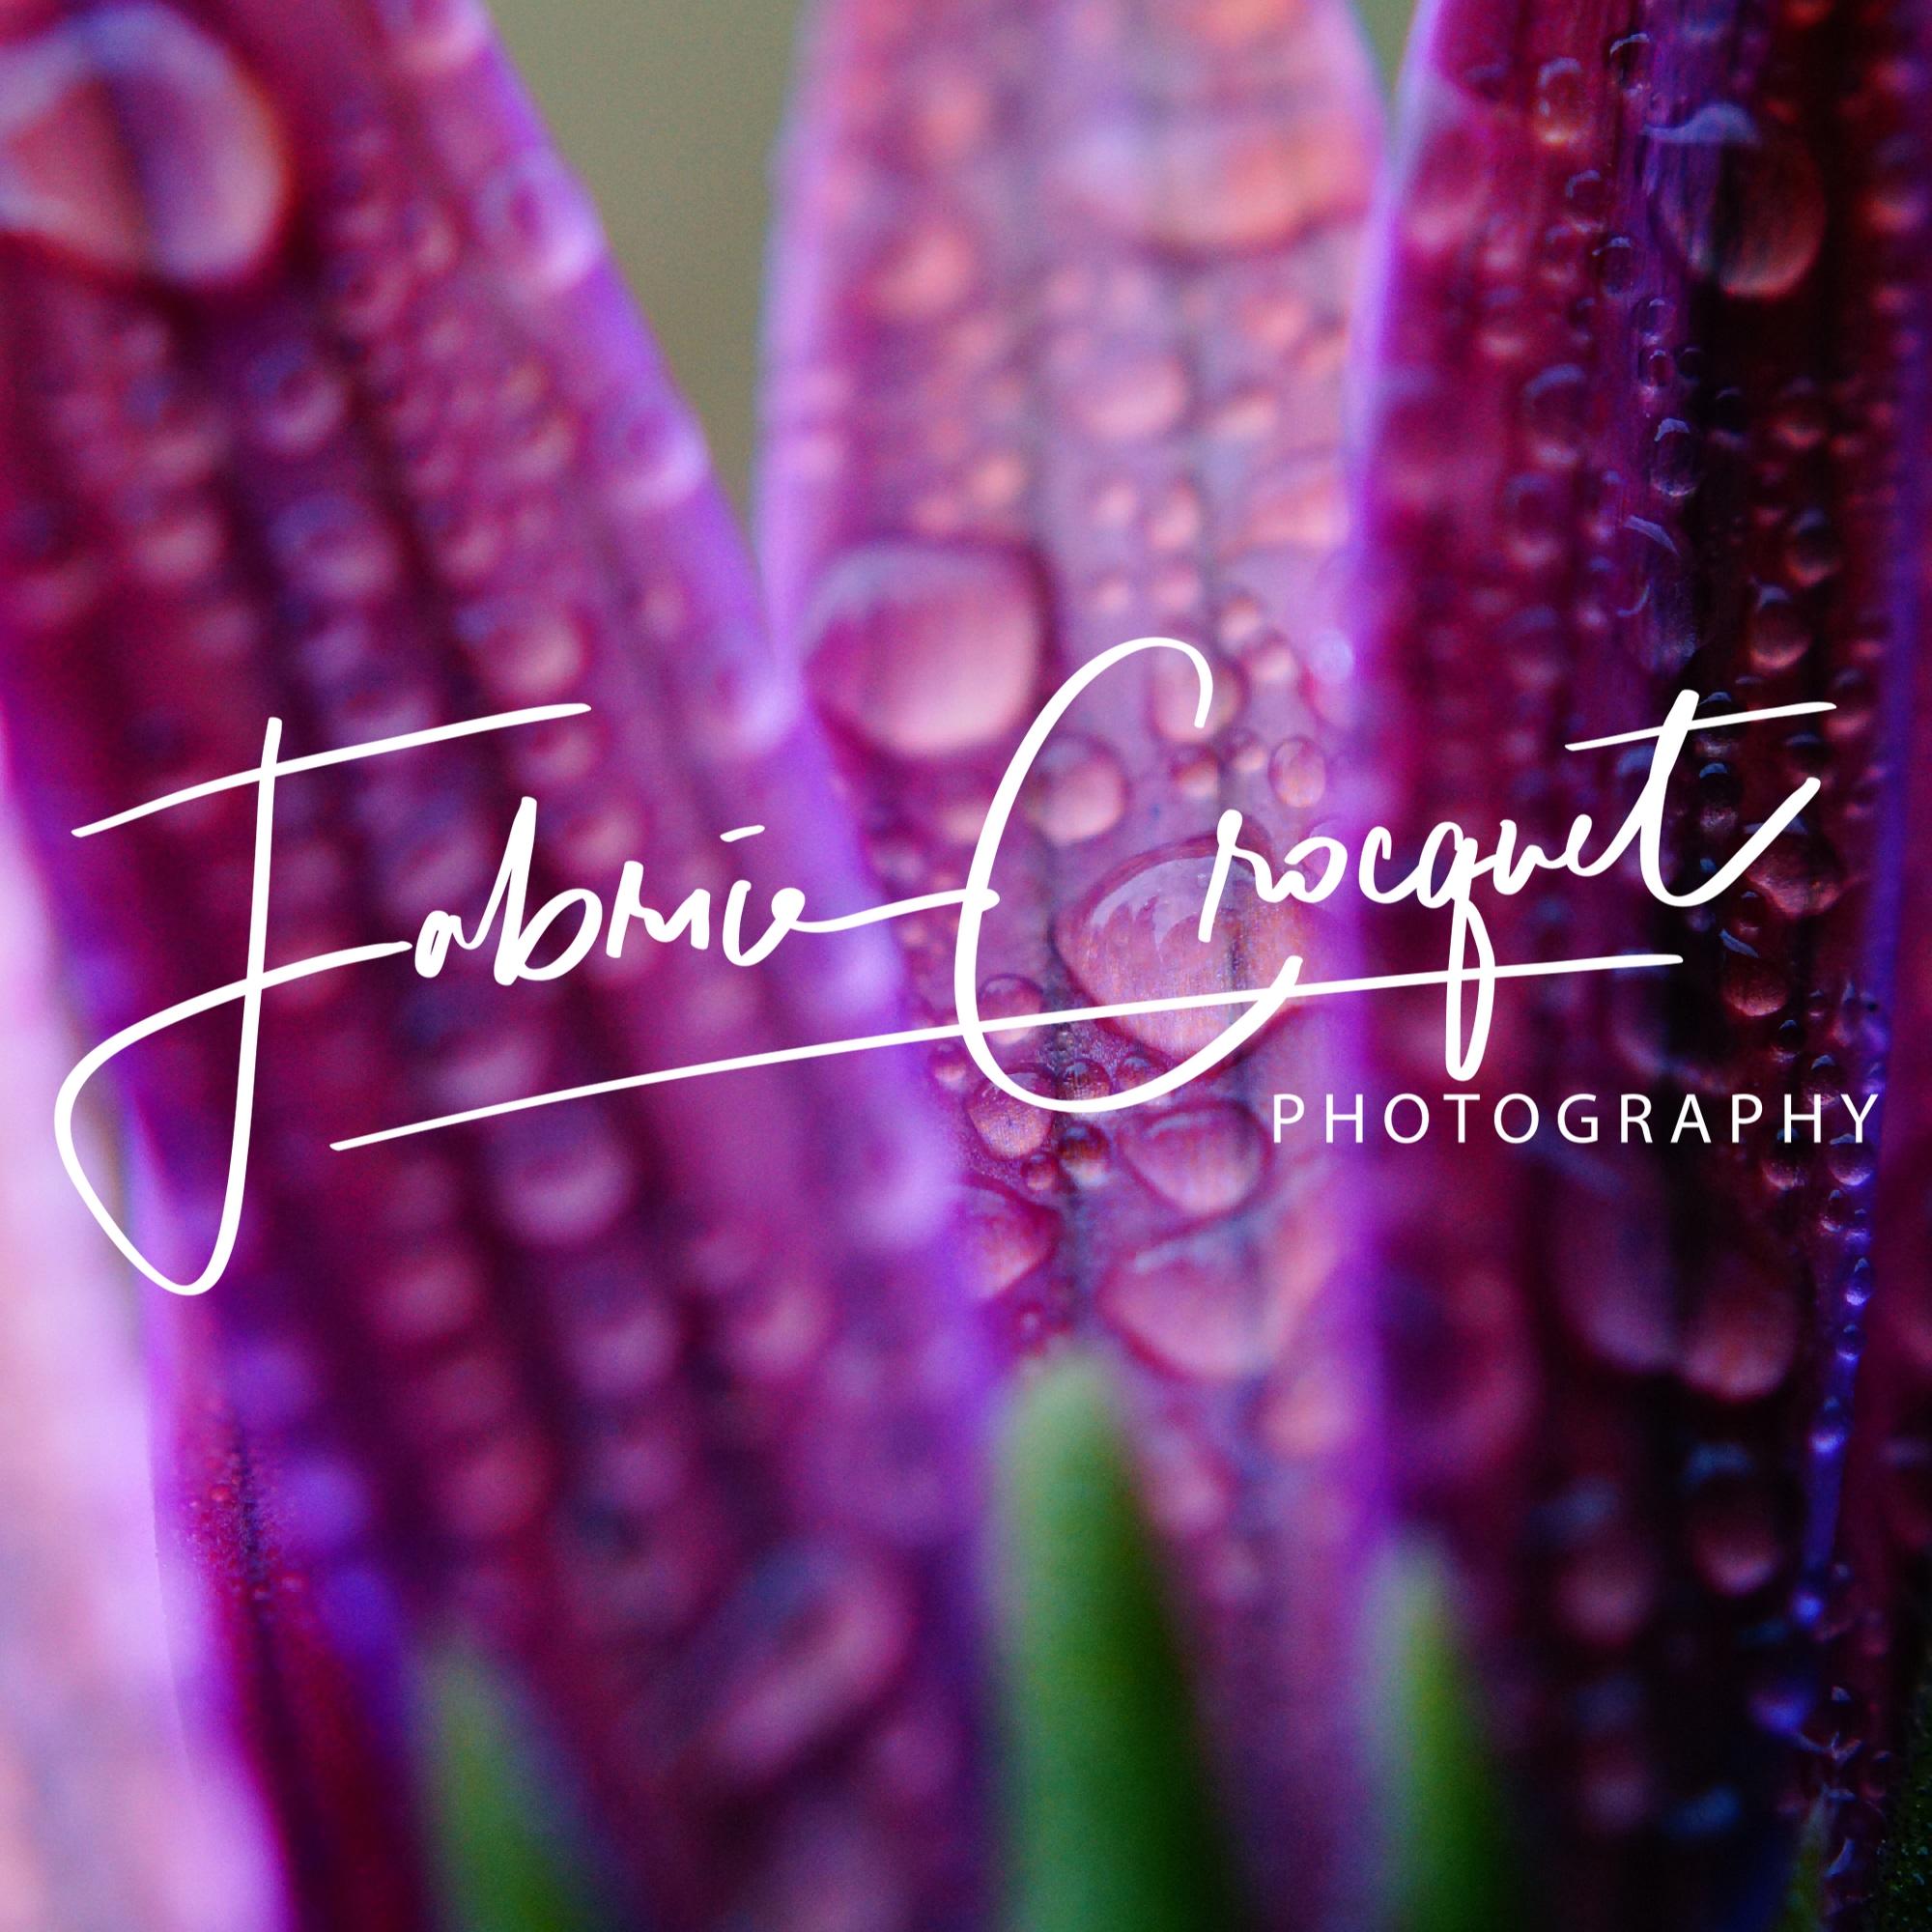 Fabrice Crocquet Photography